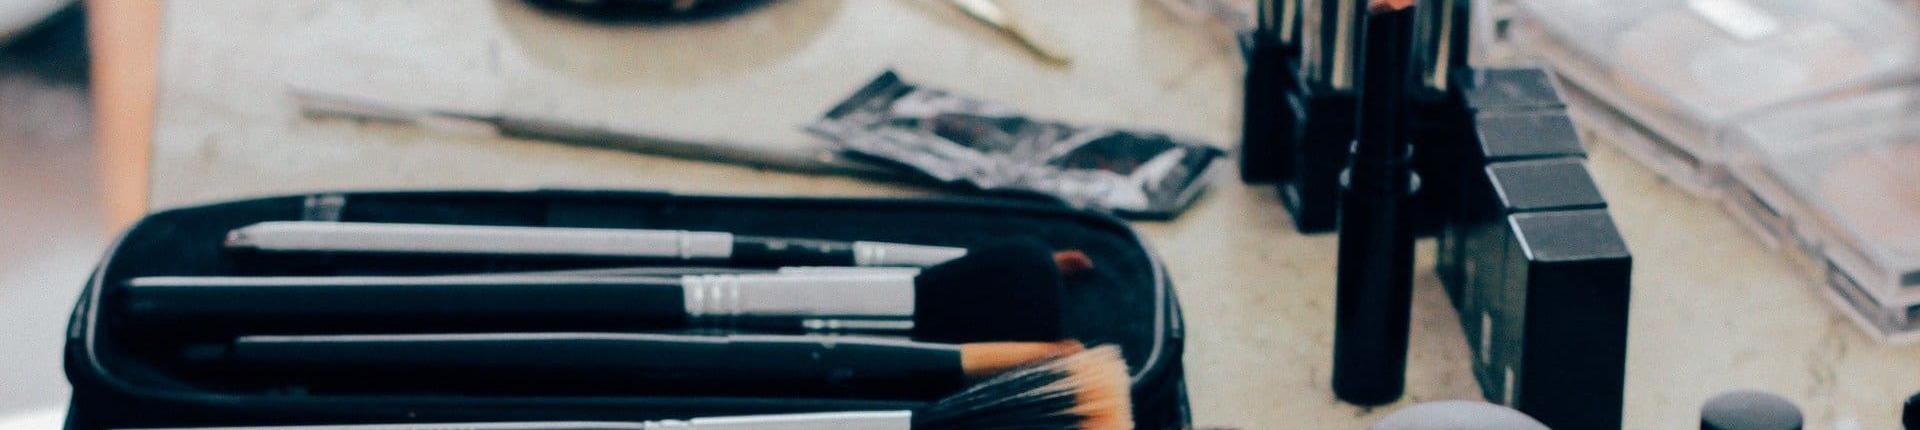 Beauty Beiträge Vergleichsmensch